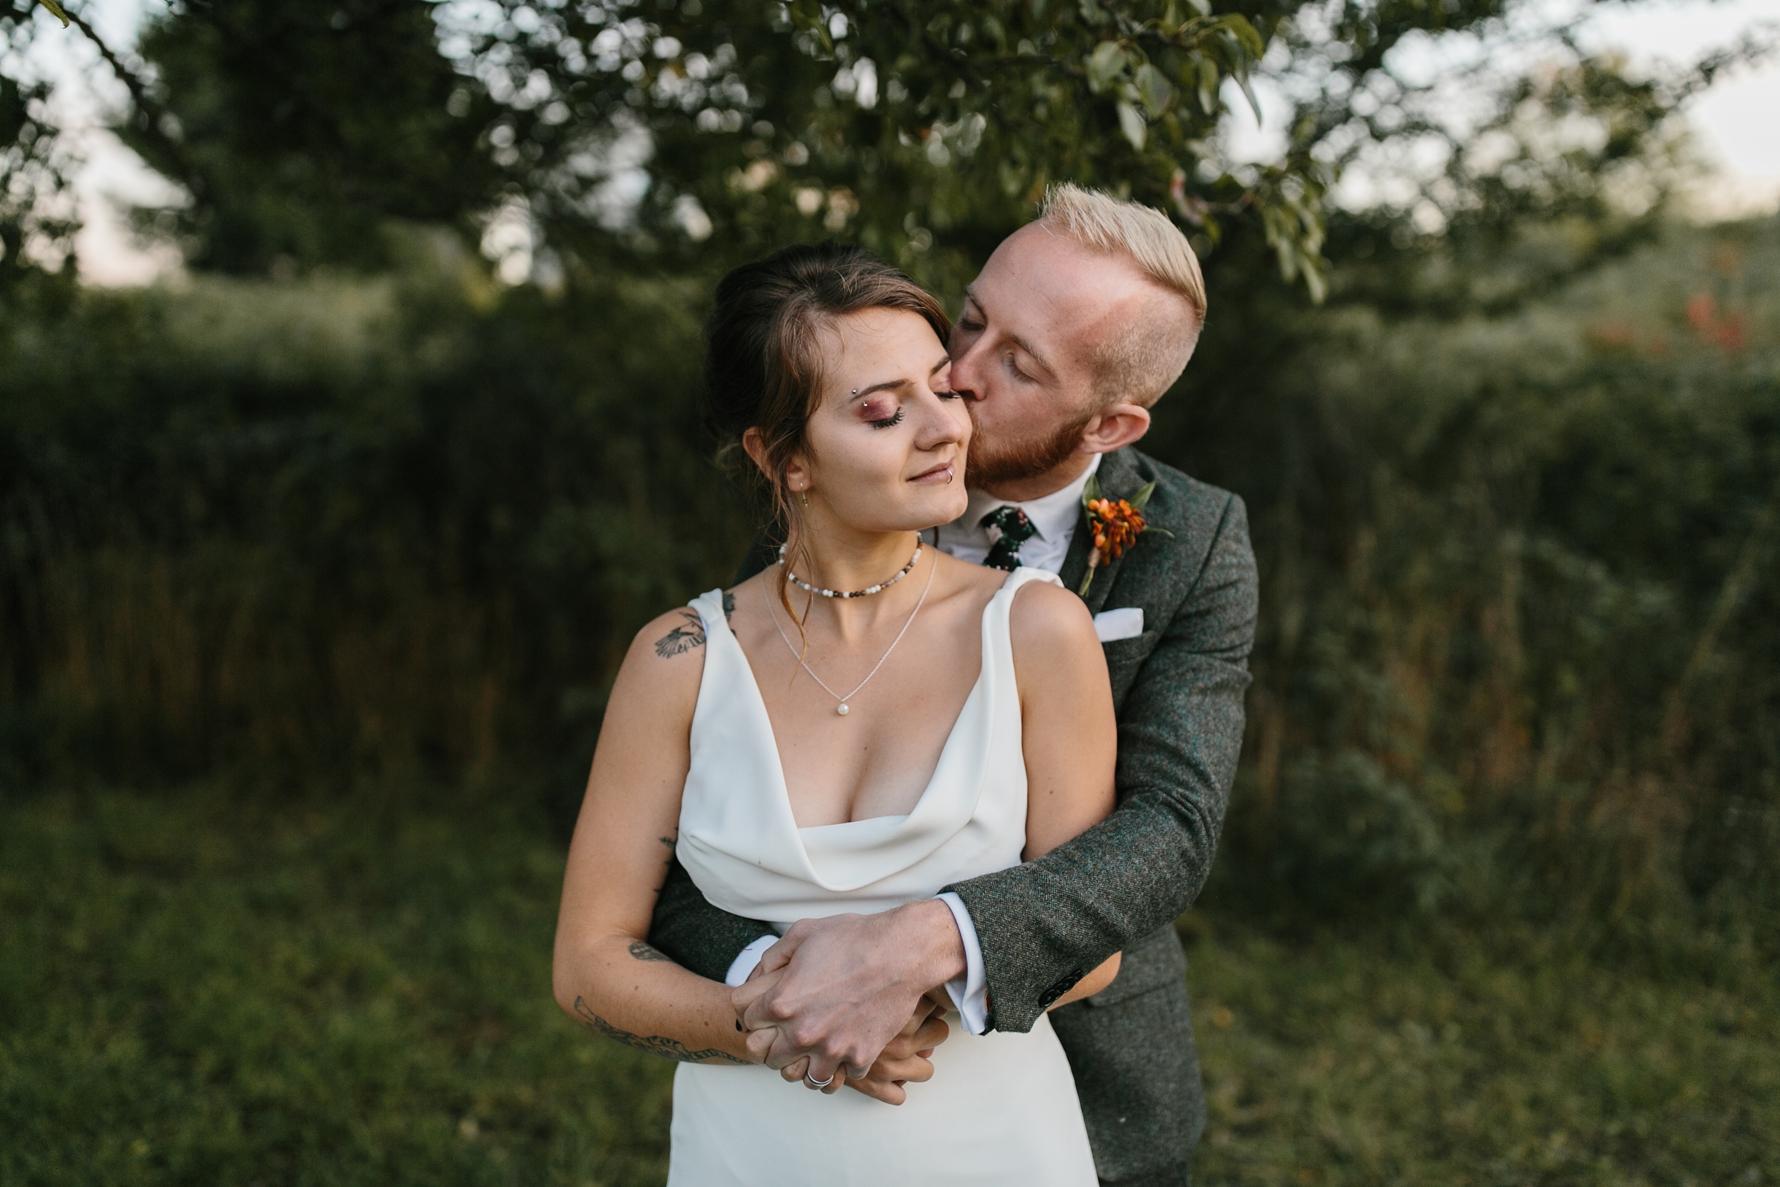 norris-traverse-city-wedding-67.JPG